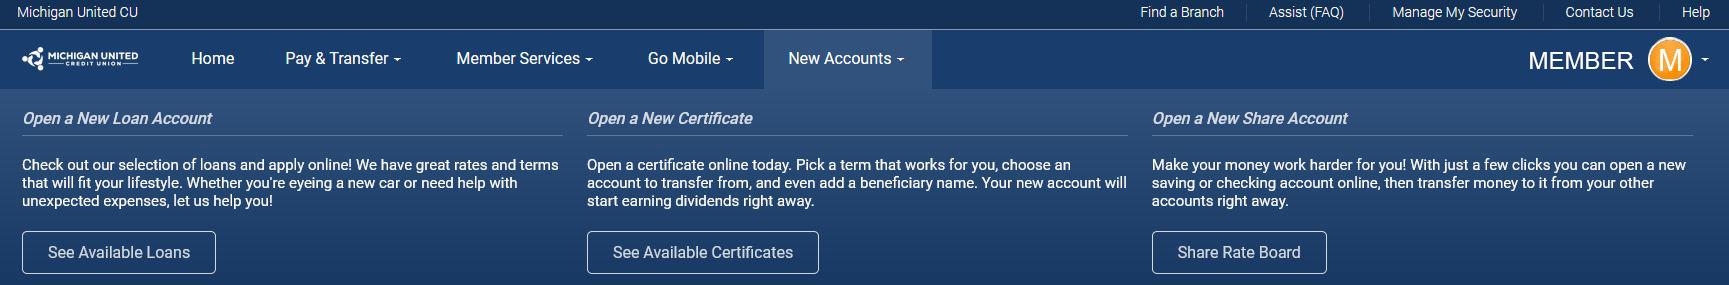 new account online banking screenshot